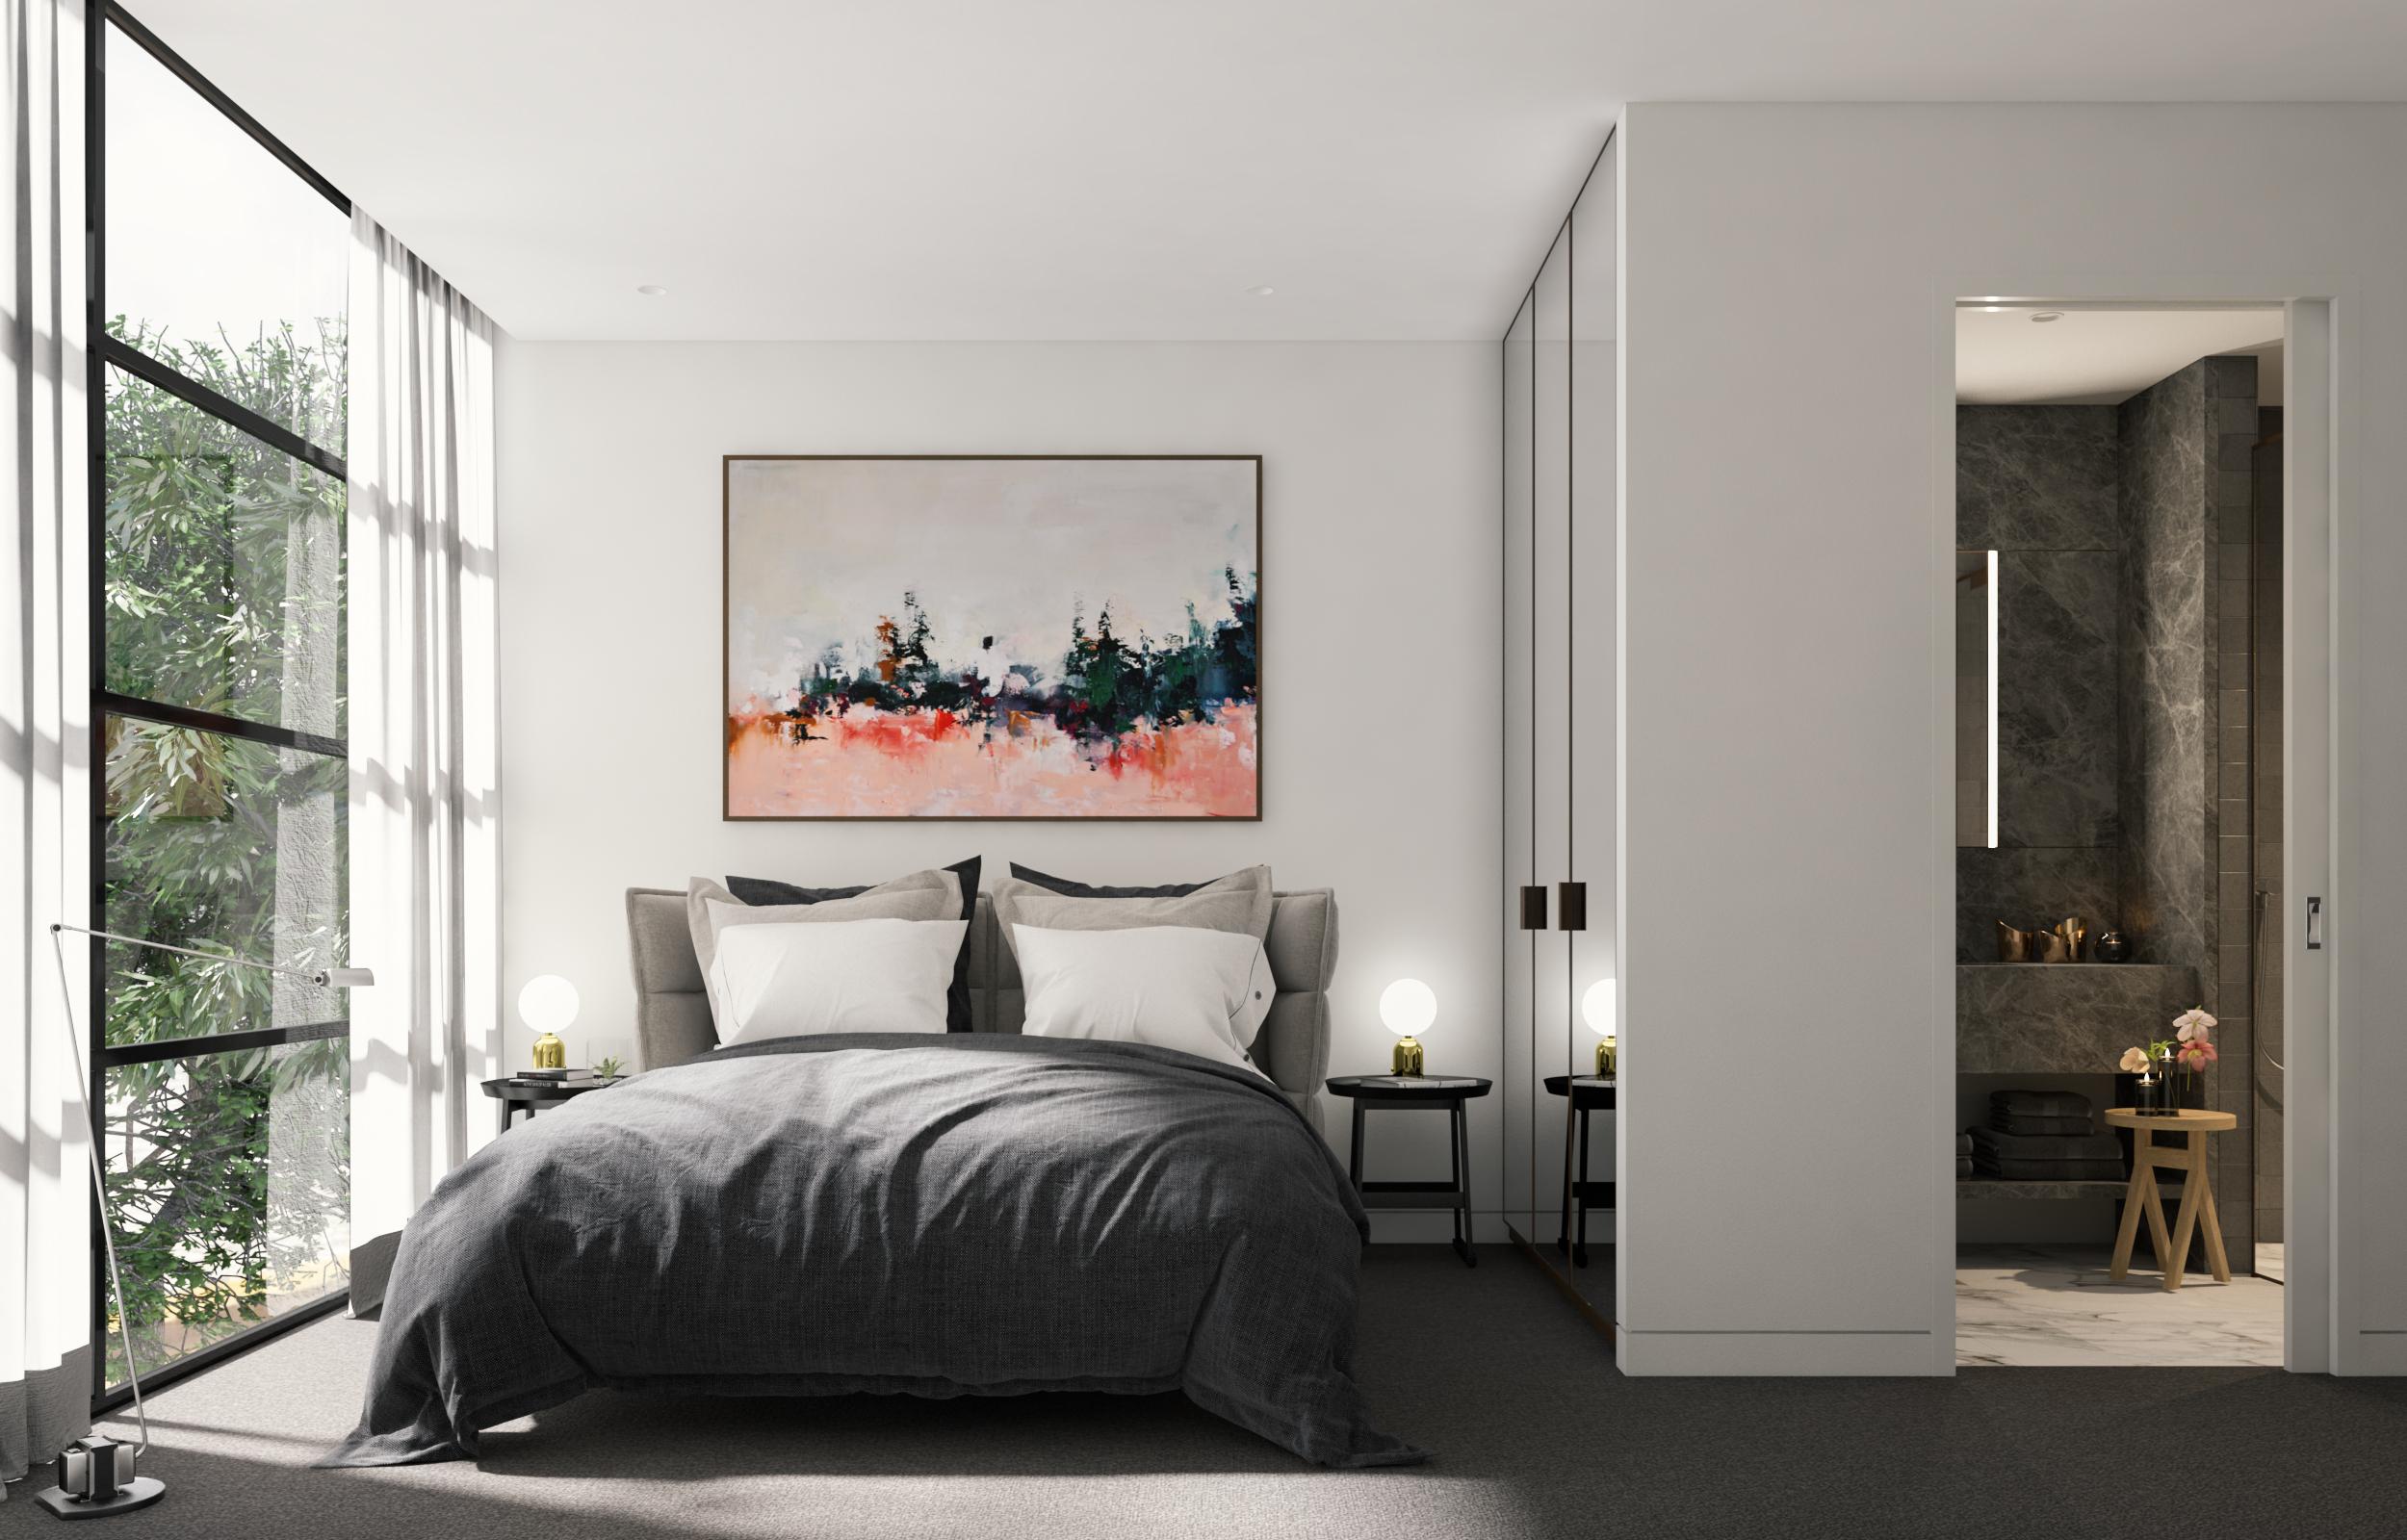 Burwood Rd - Unit 3.01 Bedroom MR.jpg